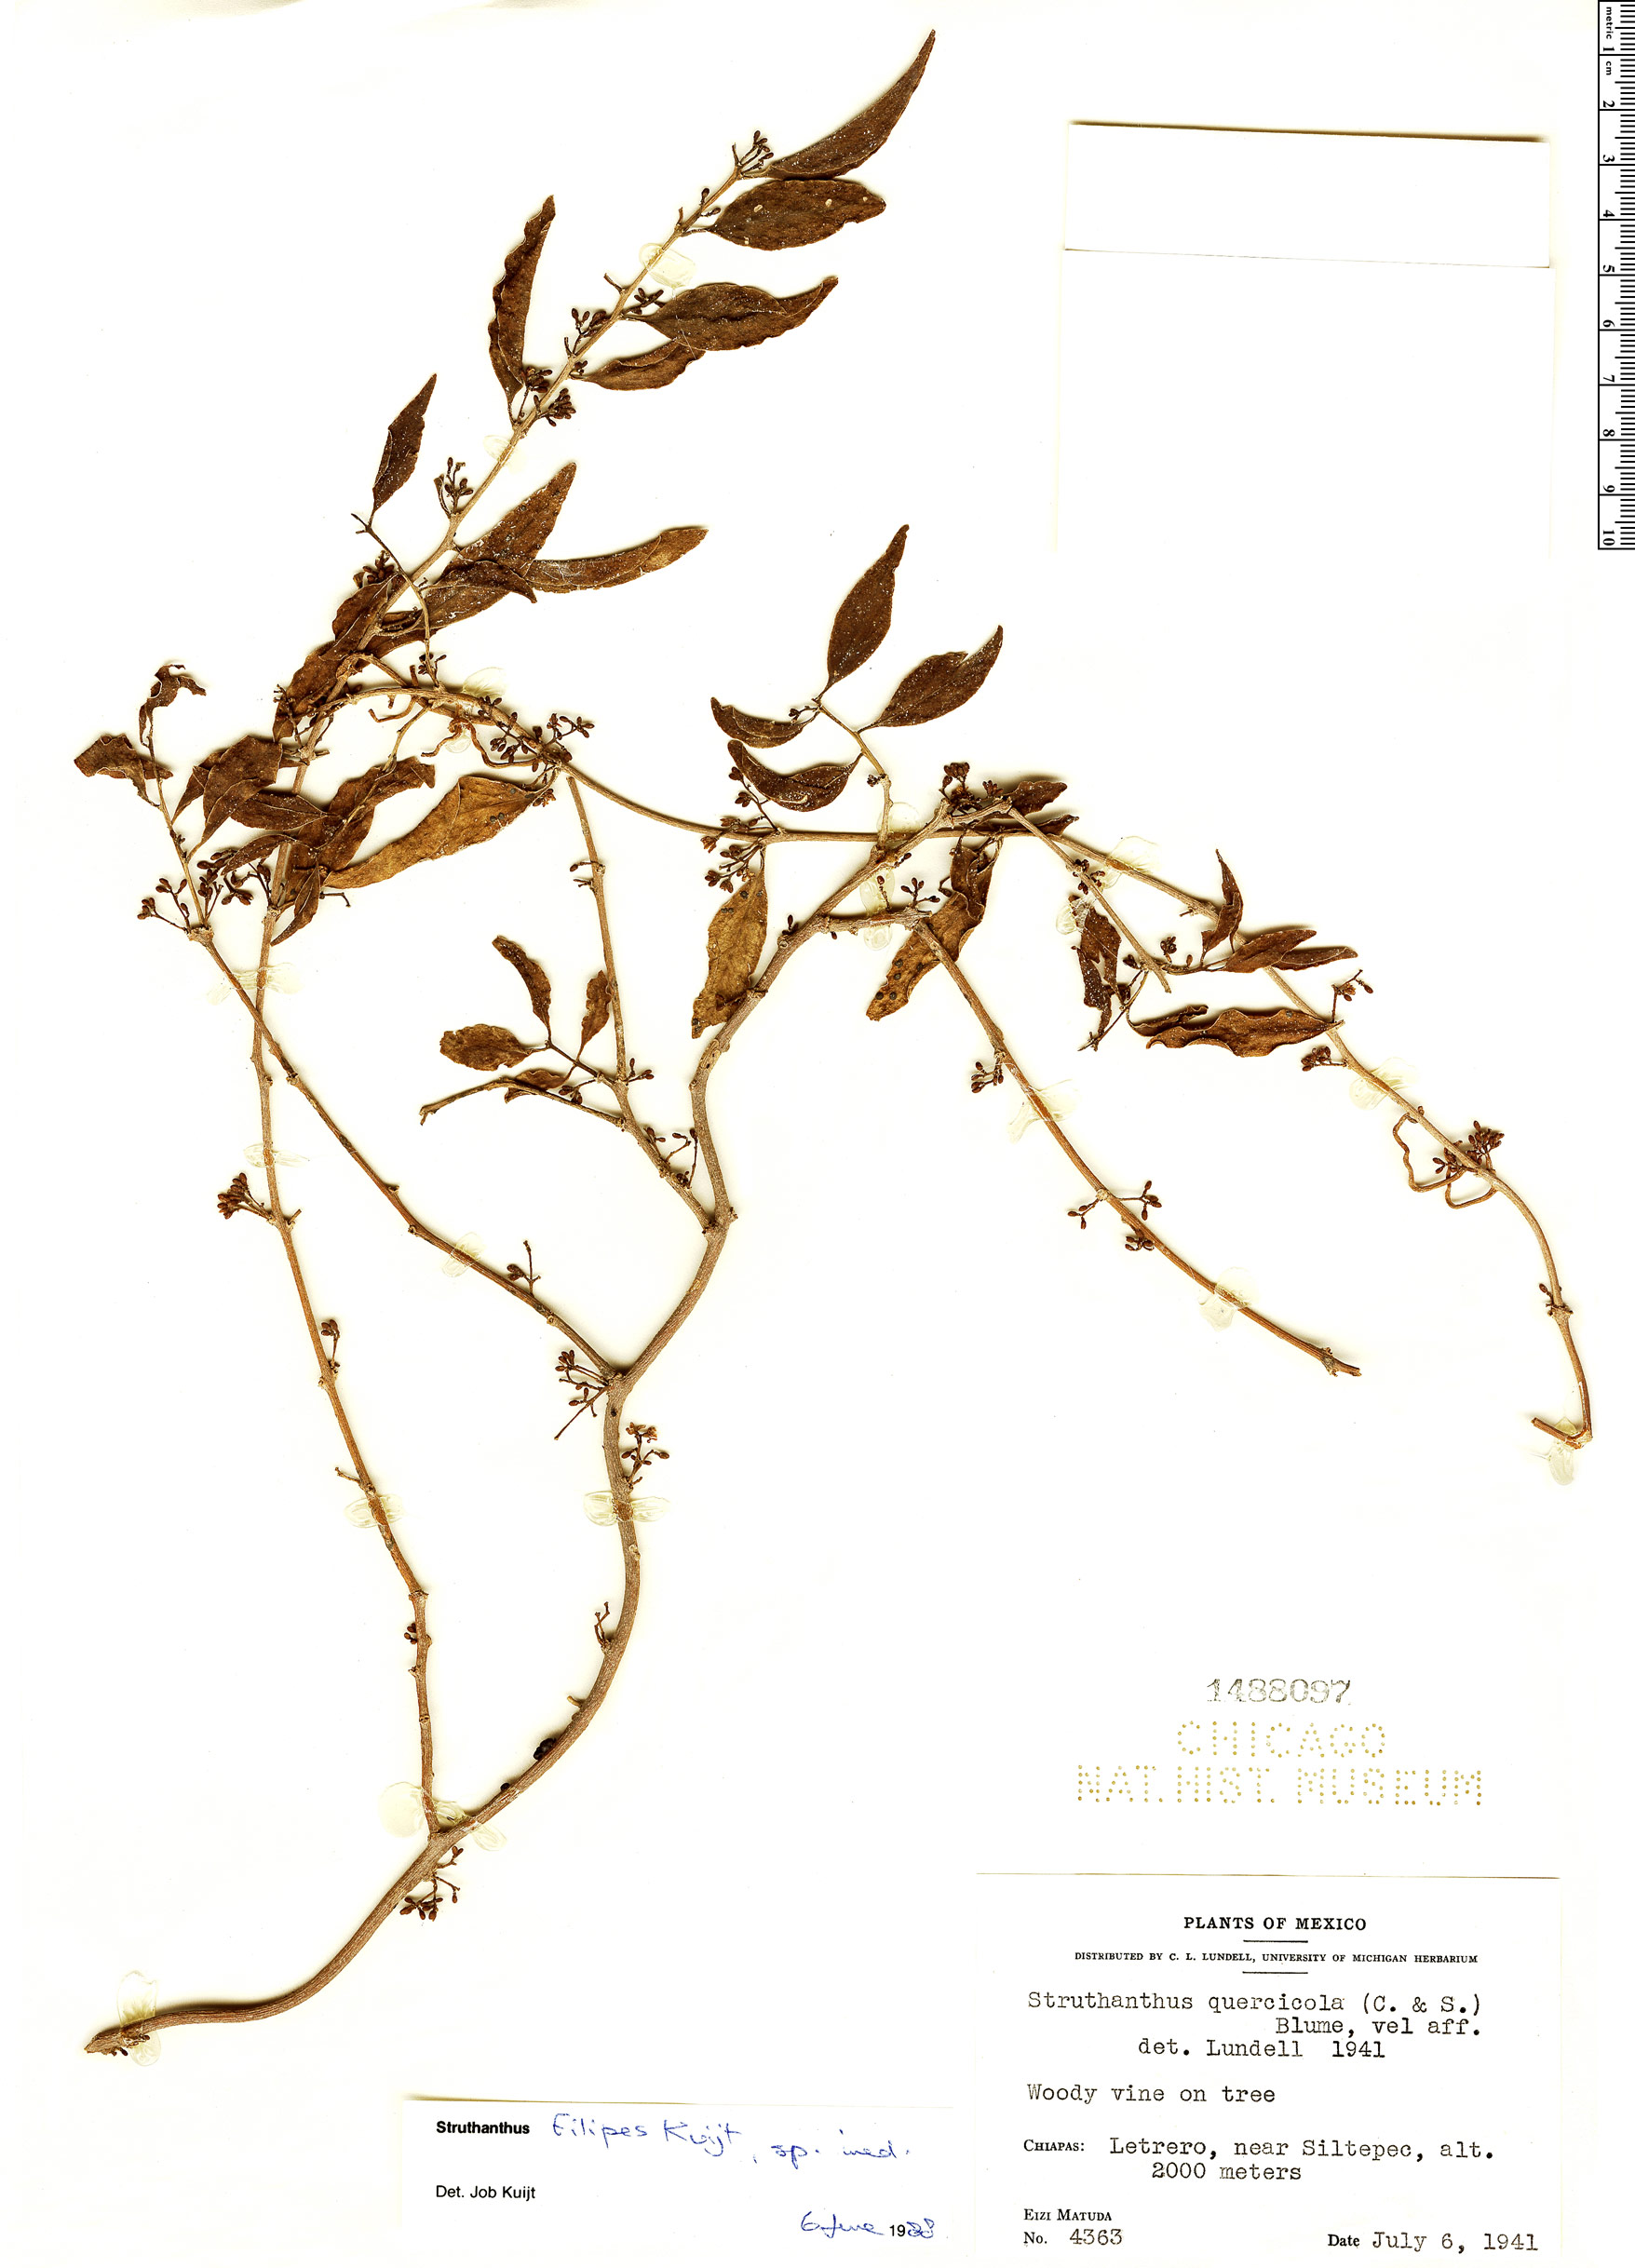 Specimen: Struthanthus filipes